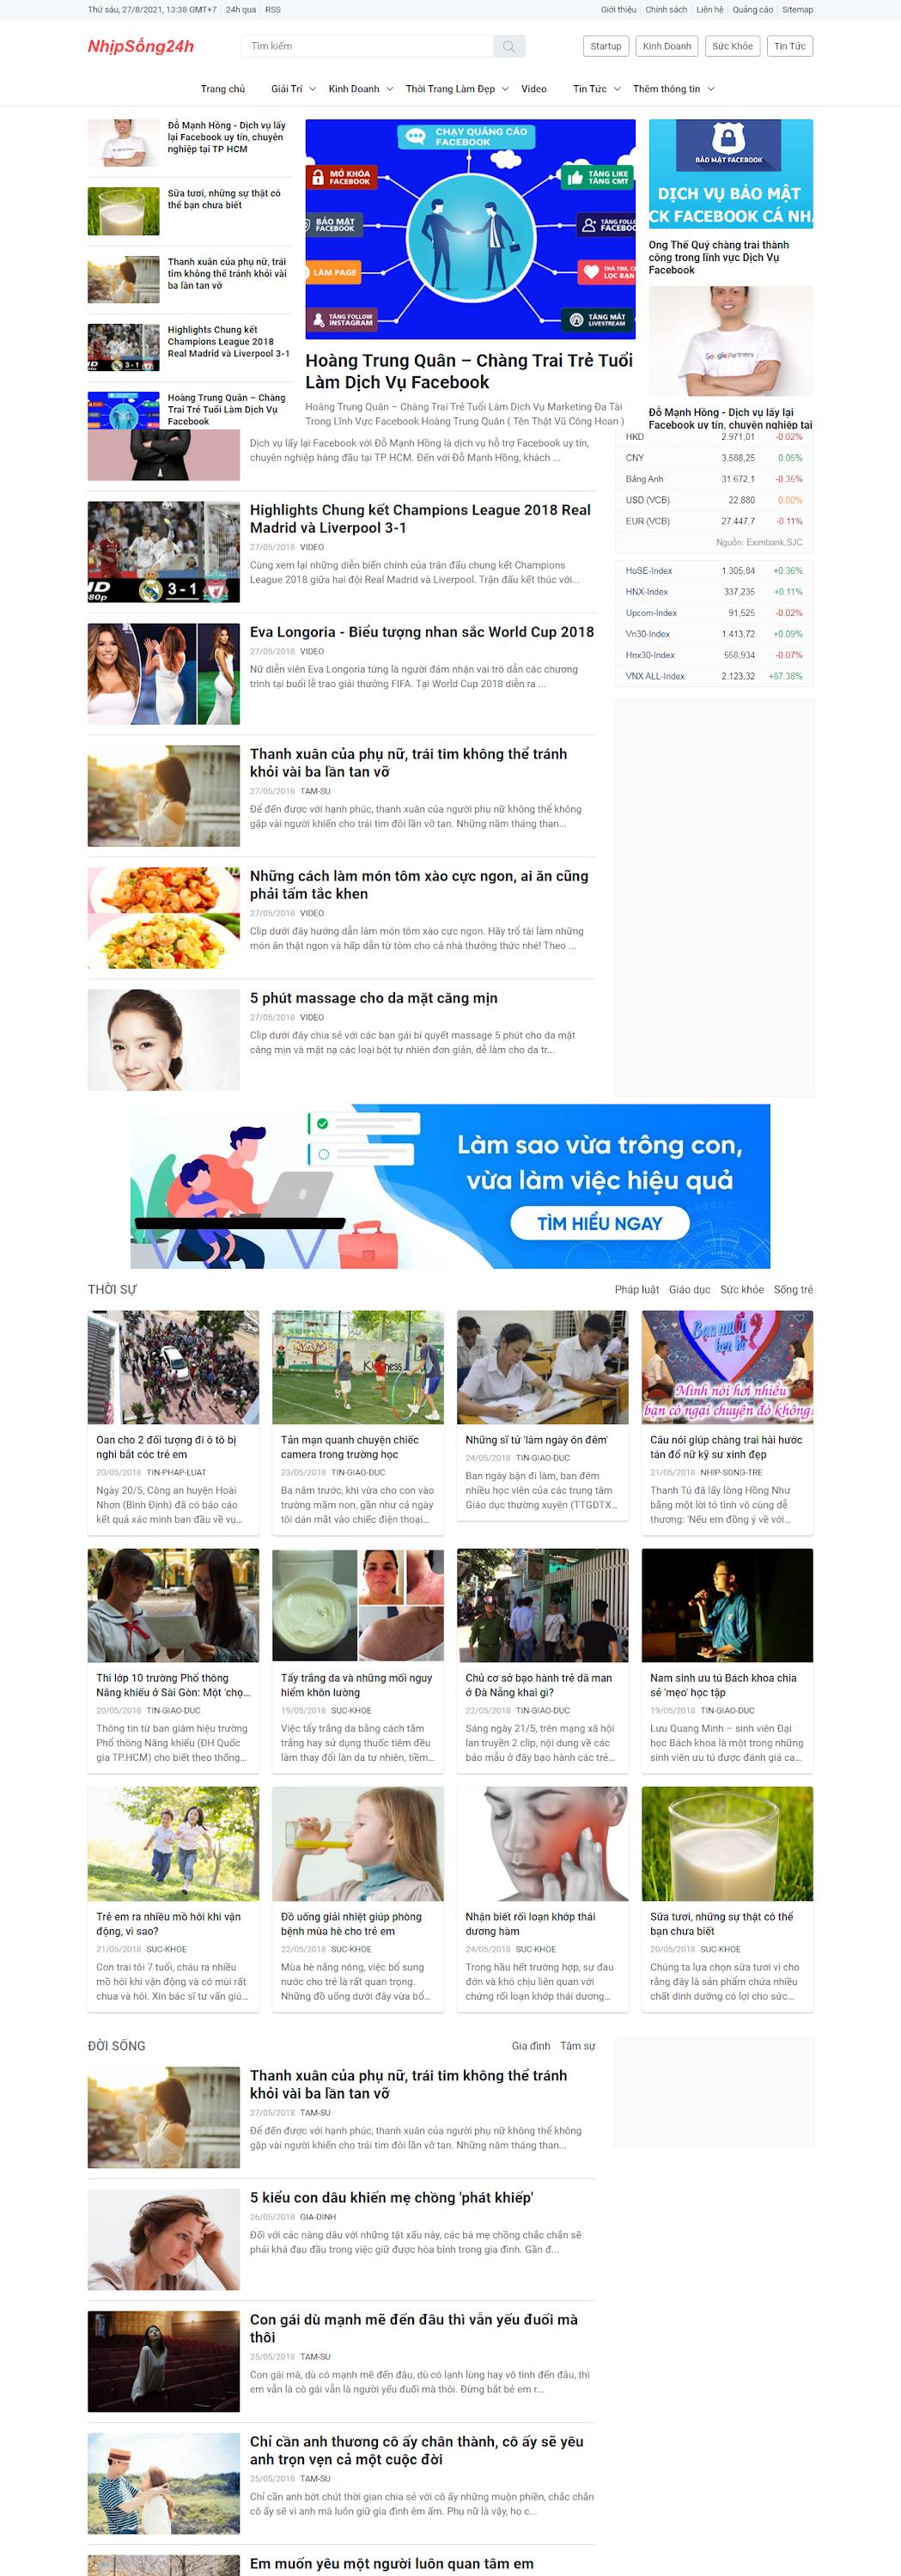 Template blogspot tin tức giống Zing News